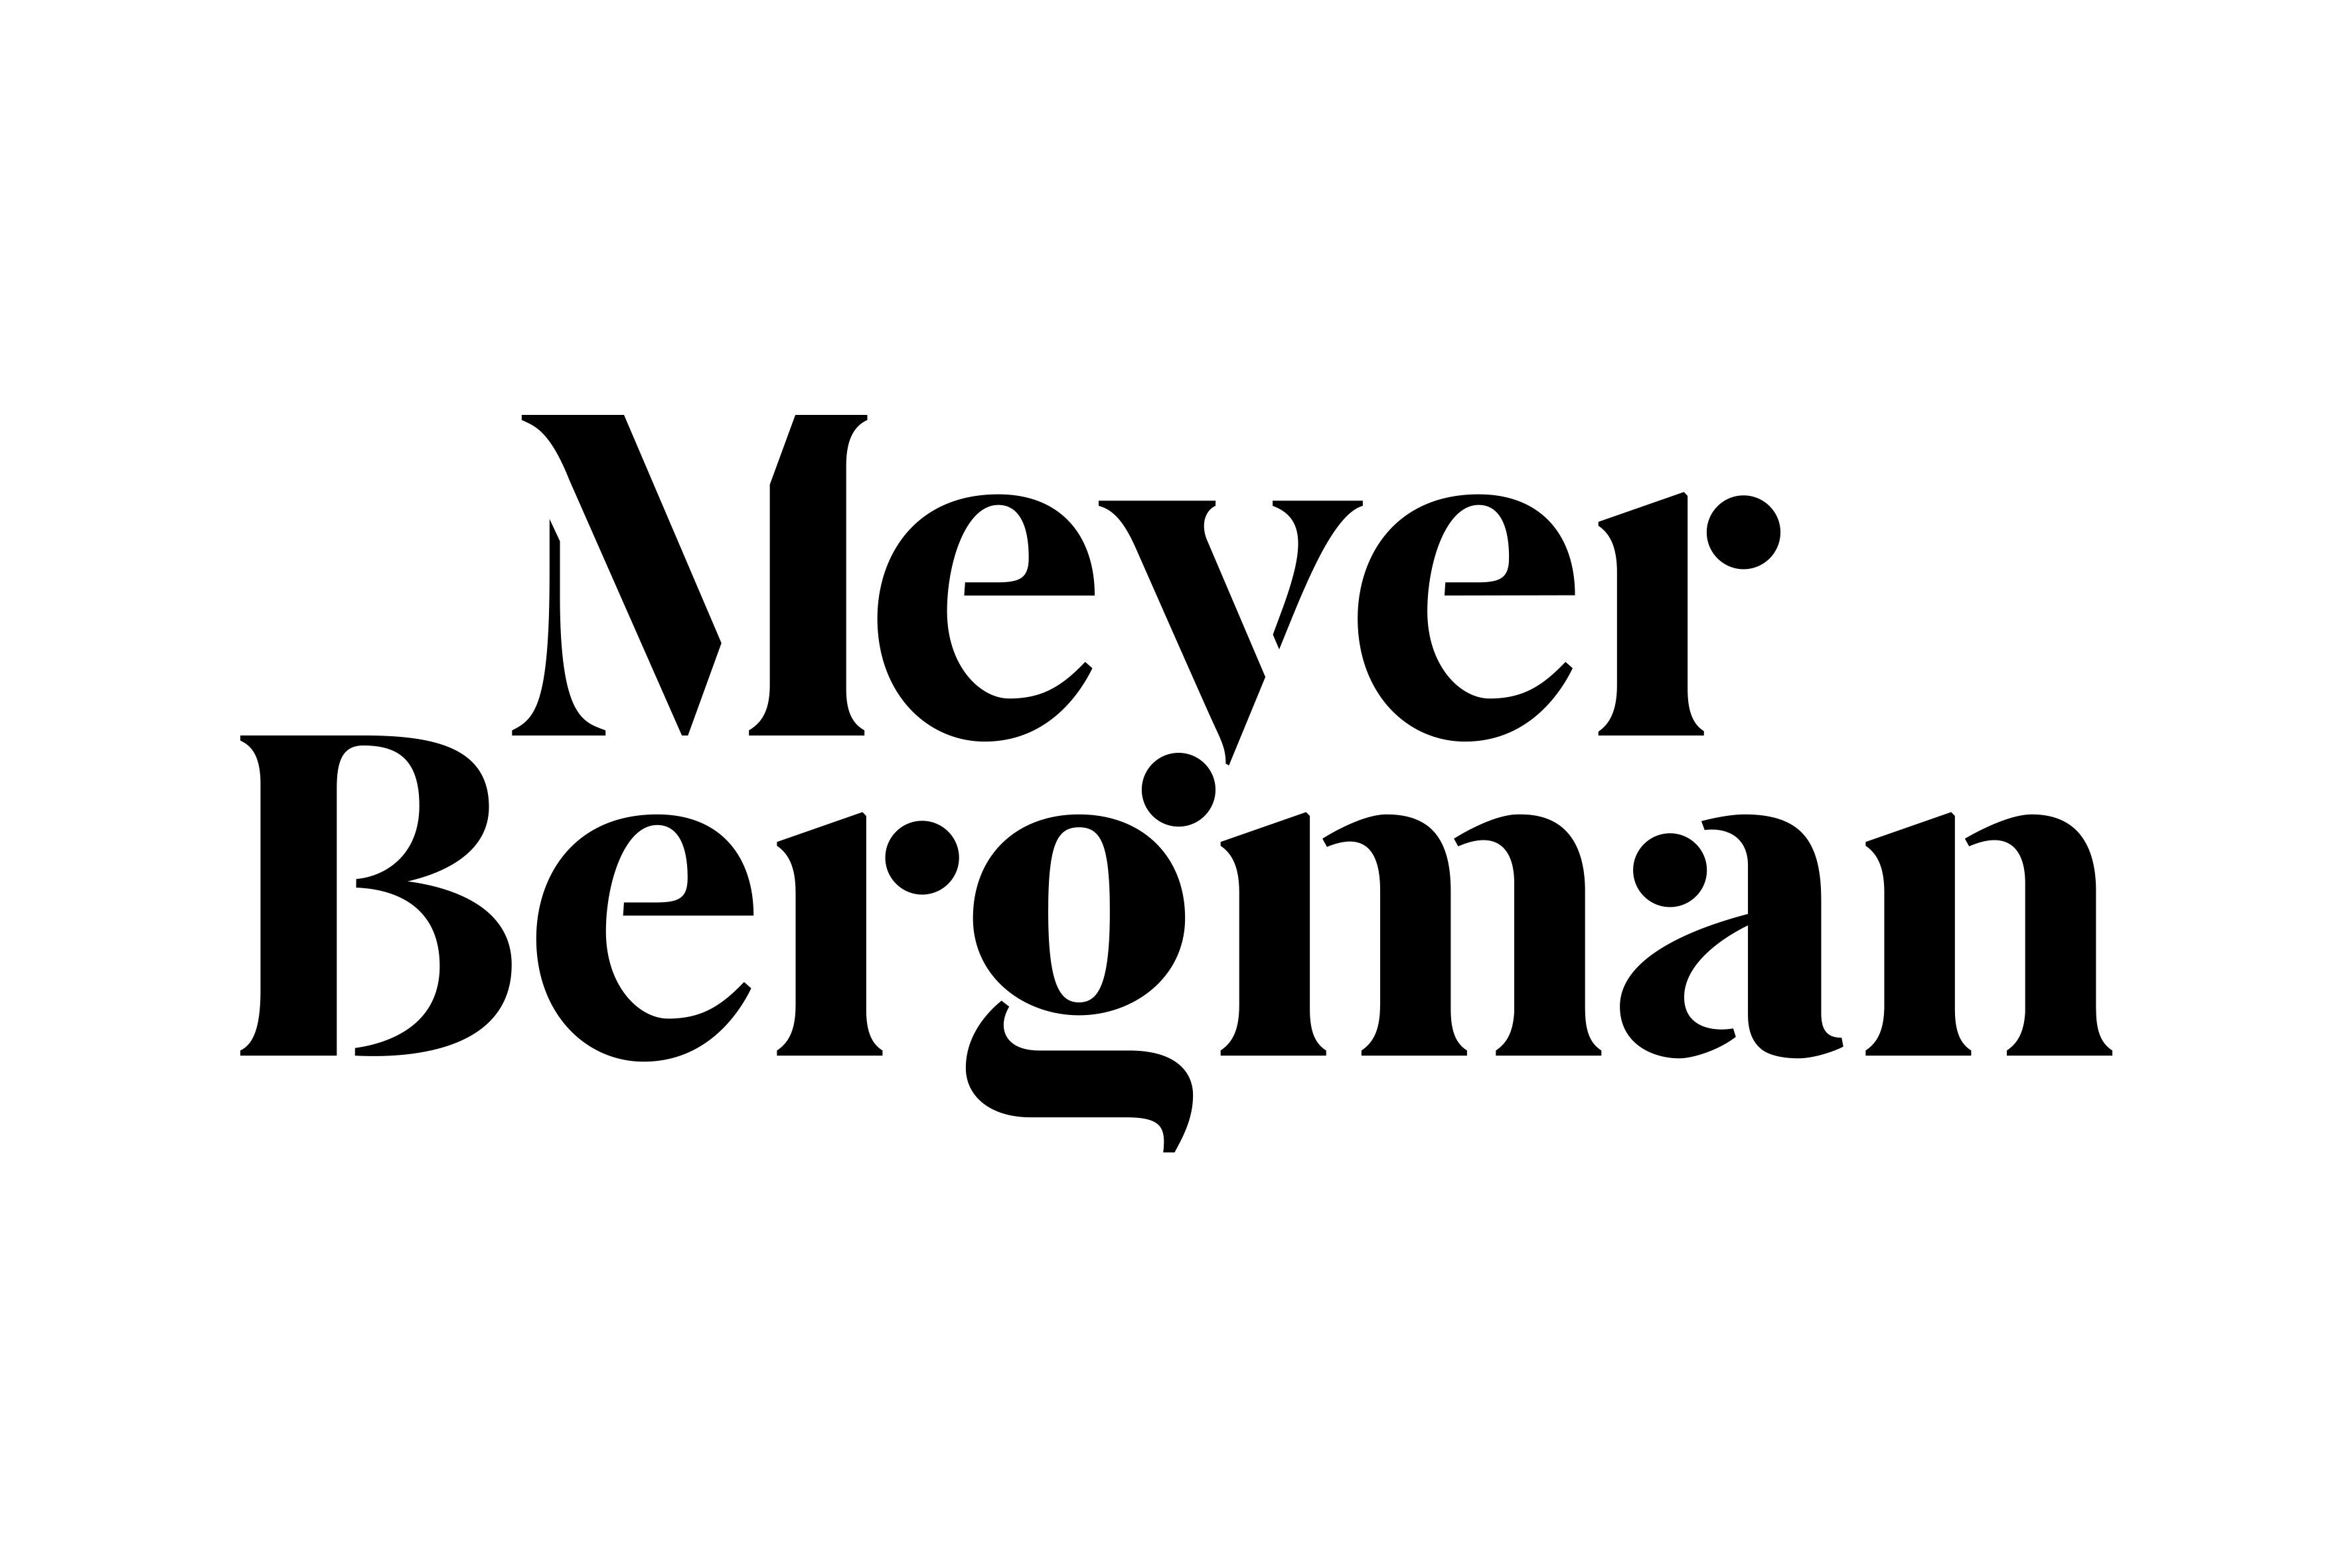 MeyerBergman_Logotype